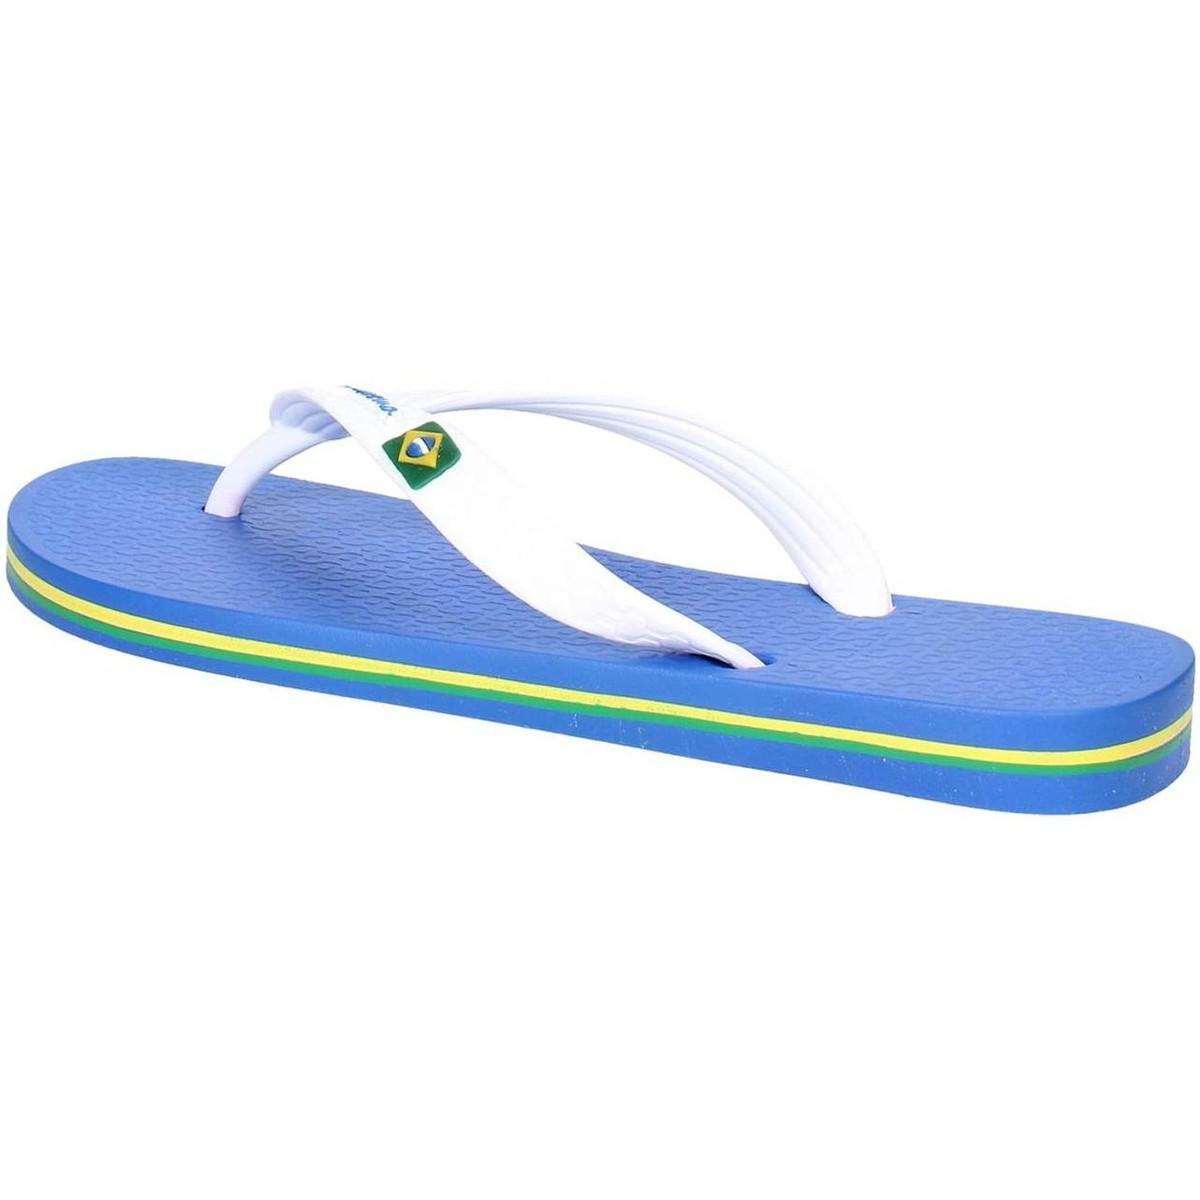 Оригинал Вьетнамки Женские 80408-24079 Ipanema Classica Brasil II woman slippe blue/white 2019